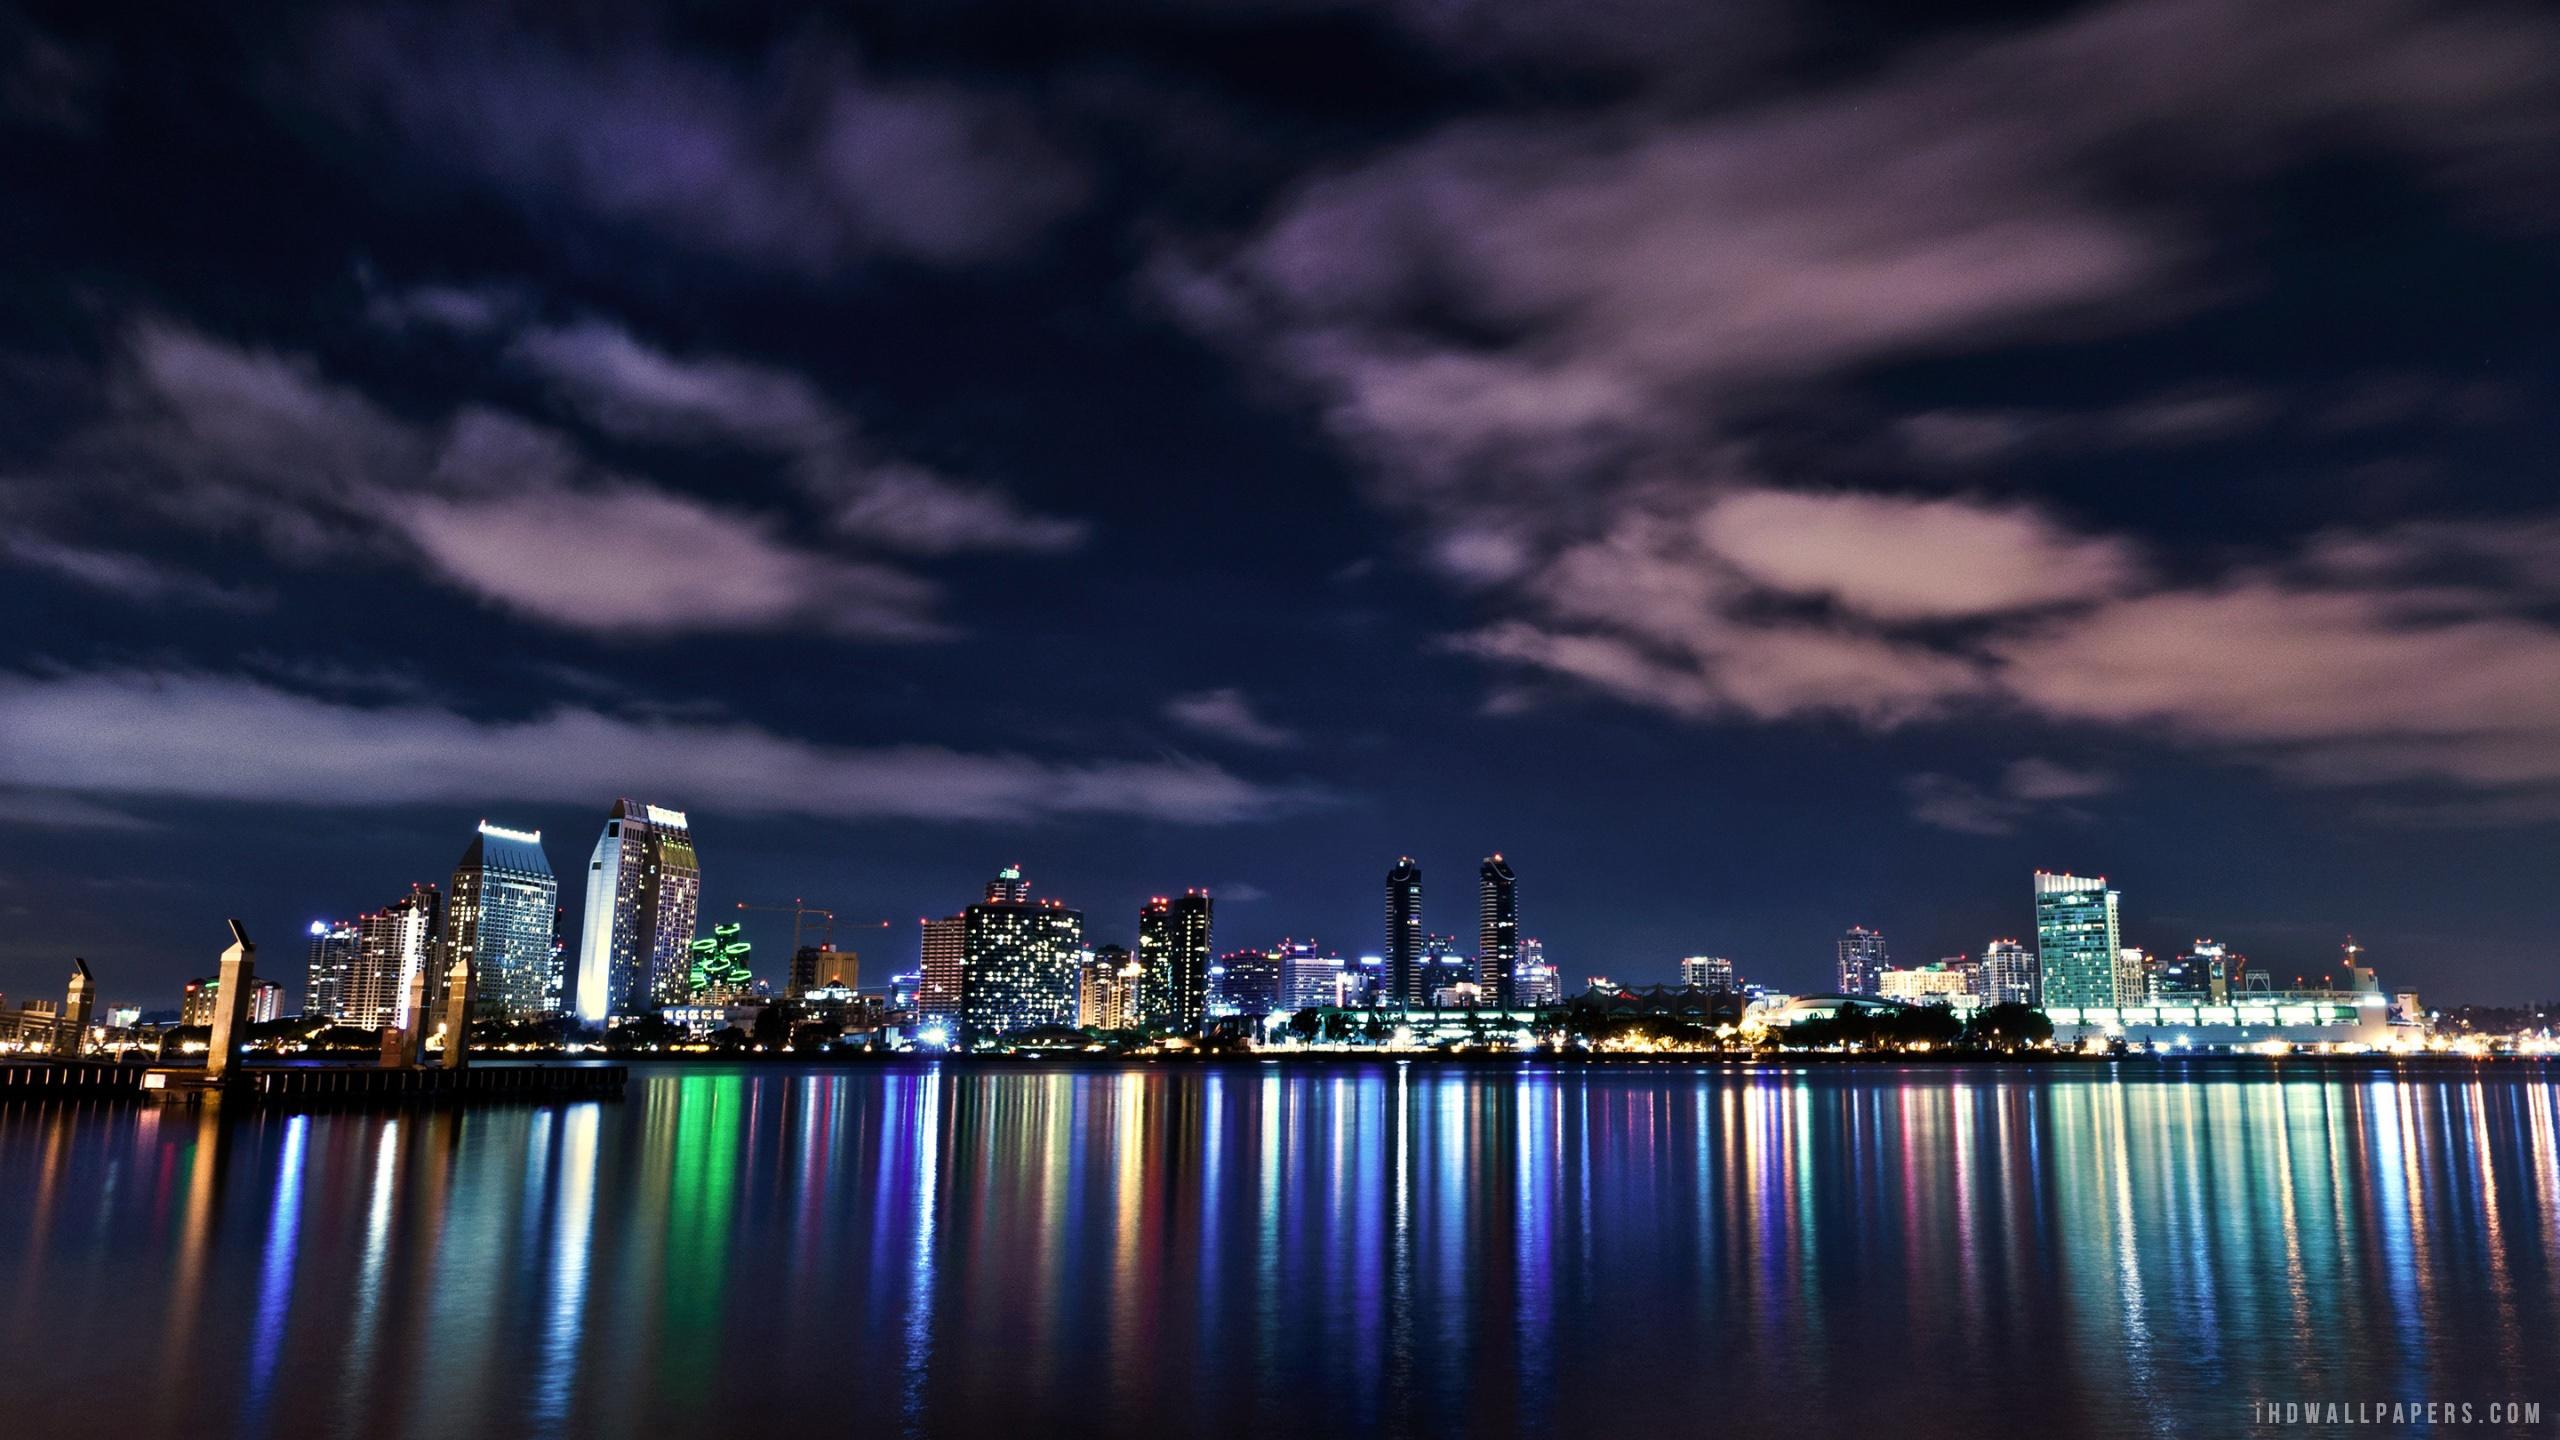 London Skyline at Night HD Wallpaper   iHD Wallpapers 2560x1440